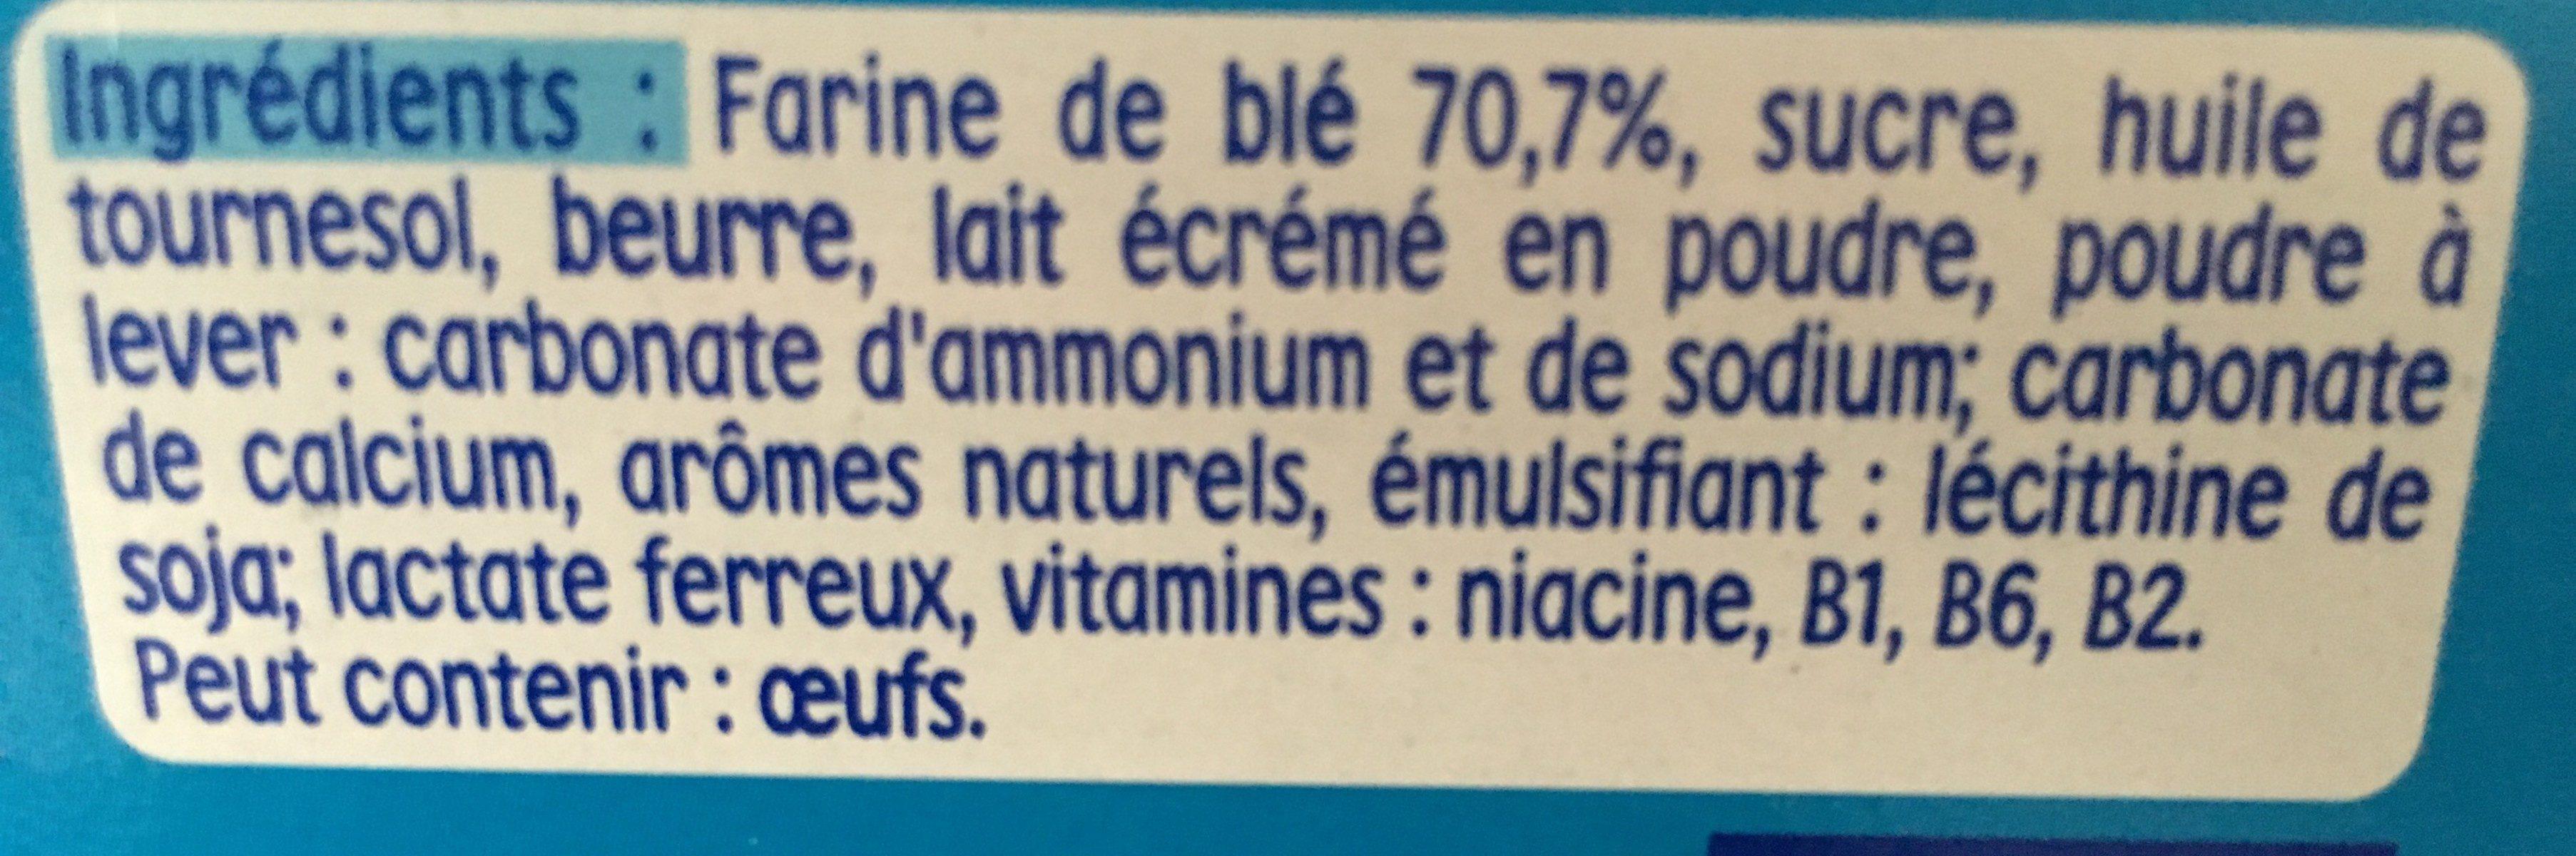 Nestle p'tit biscuit - Ingredients